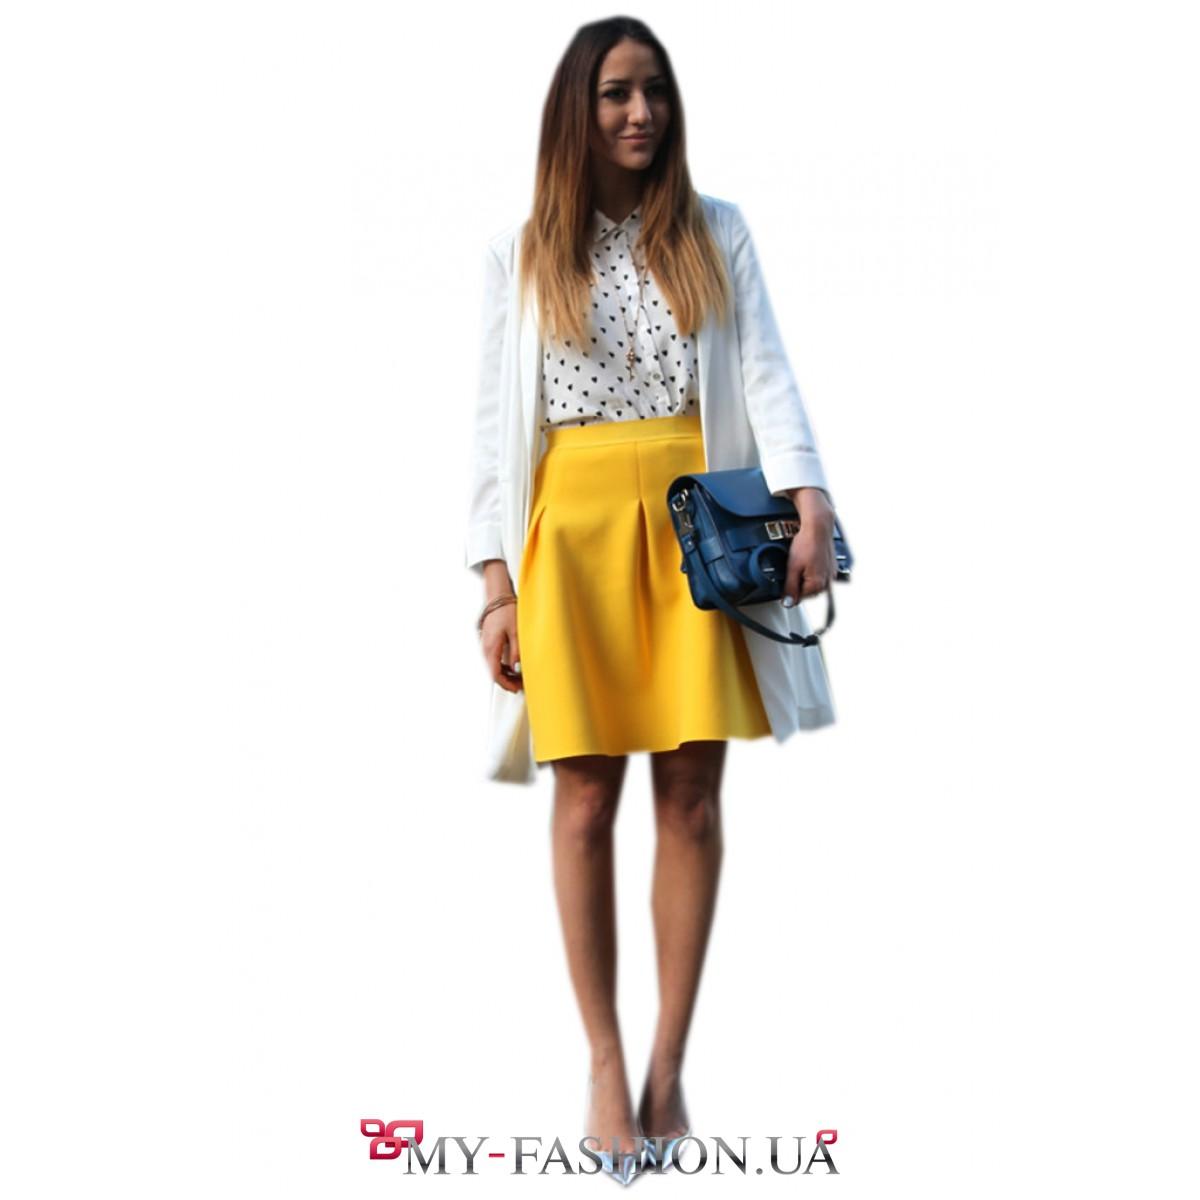 Ярко жёлтая юбка